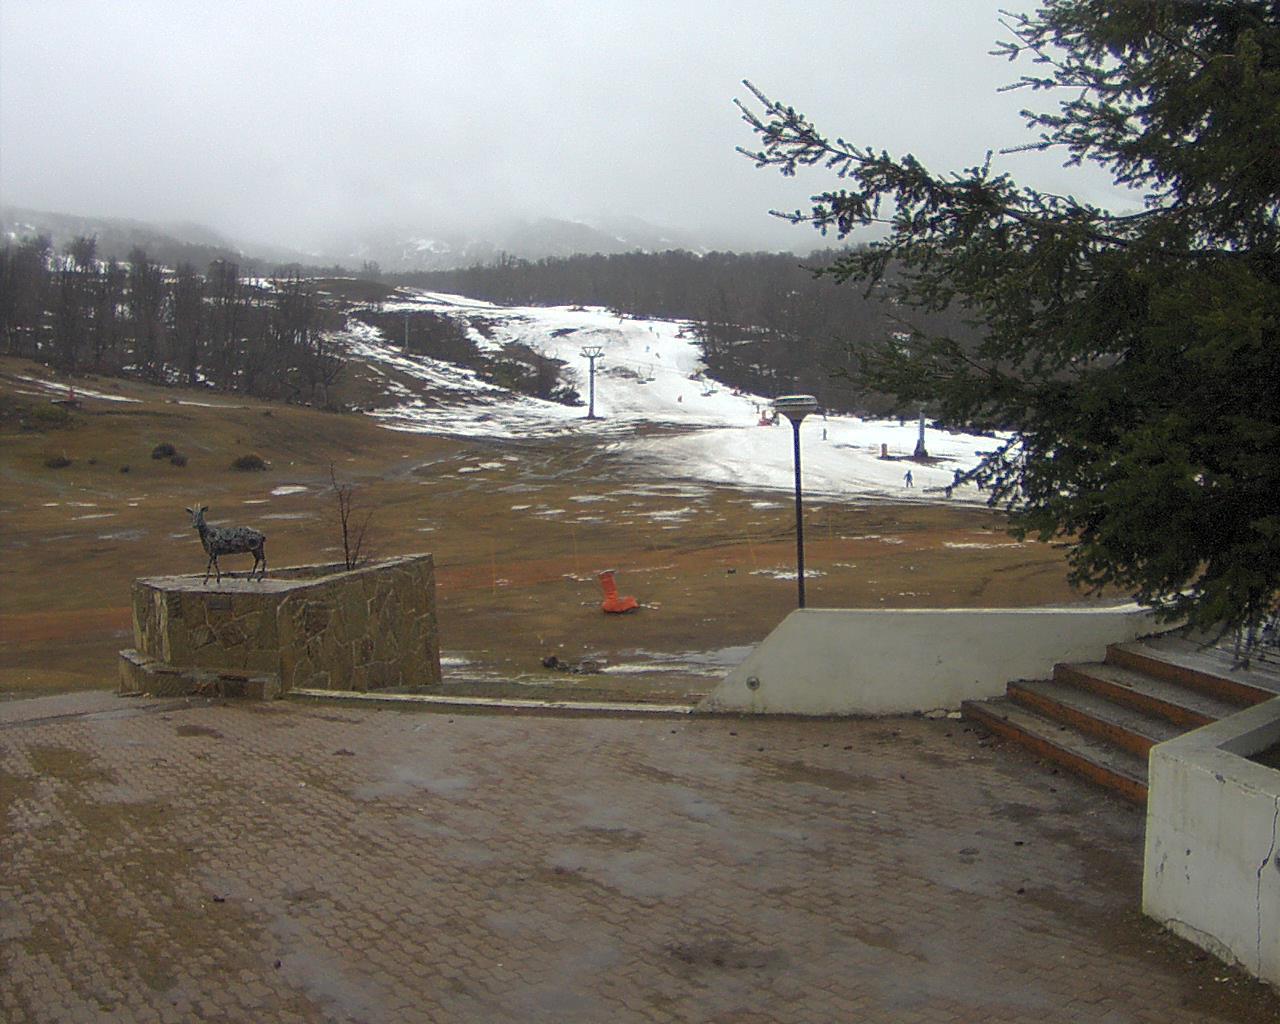 Webcam en Base - Pistas, Chapelco (Argentina)